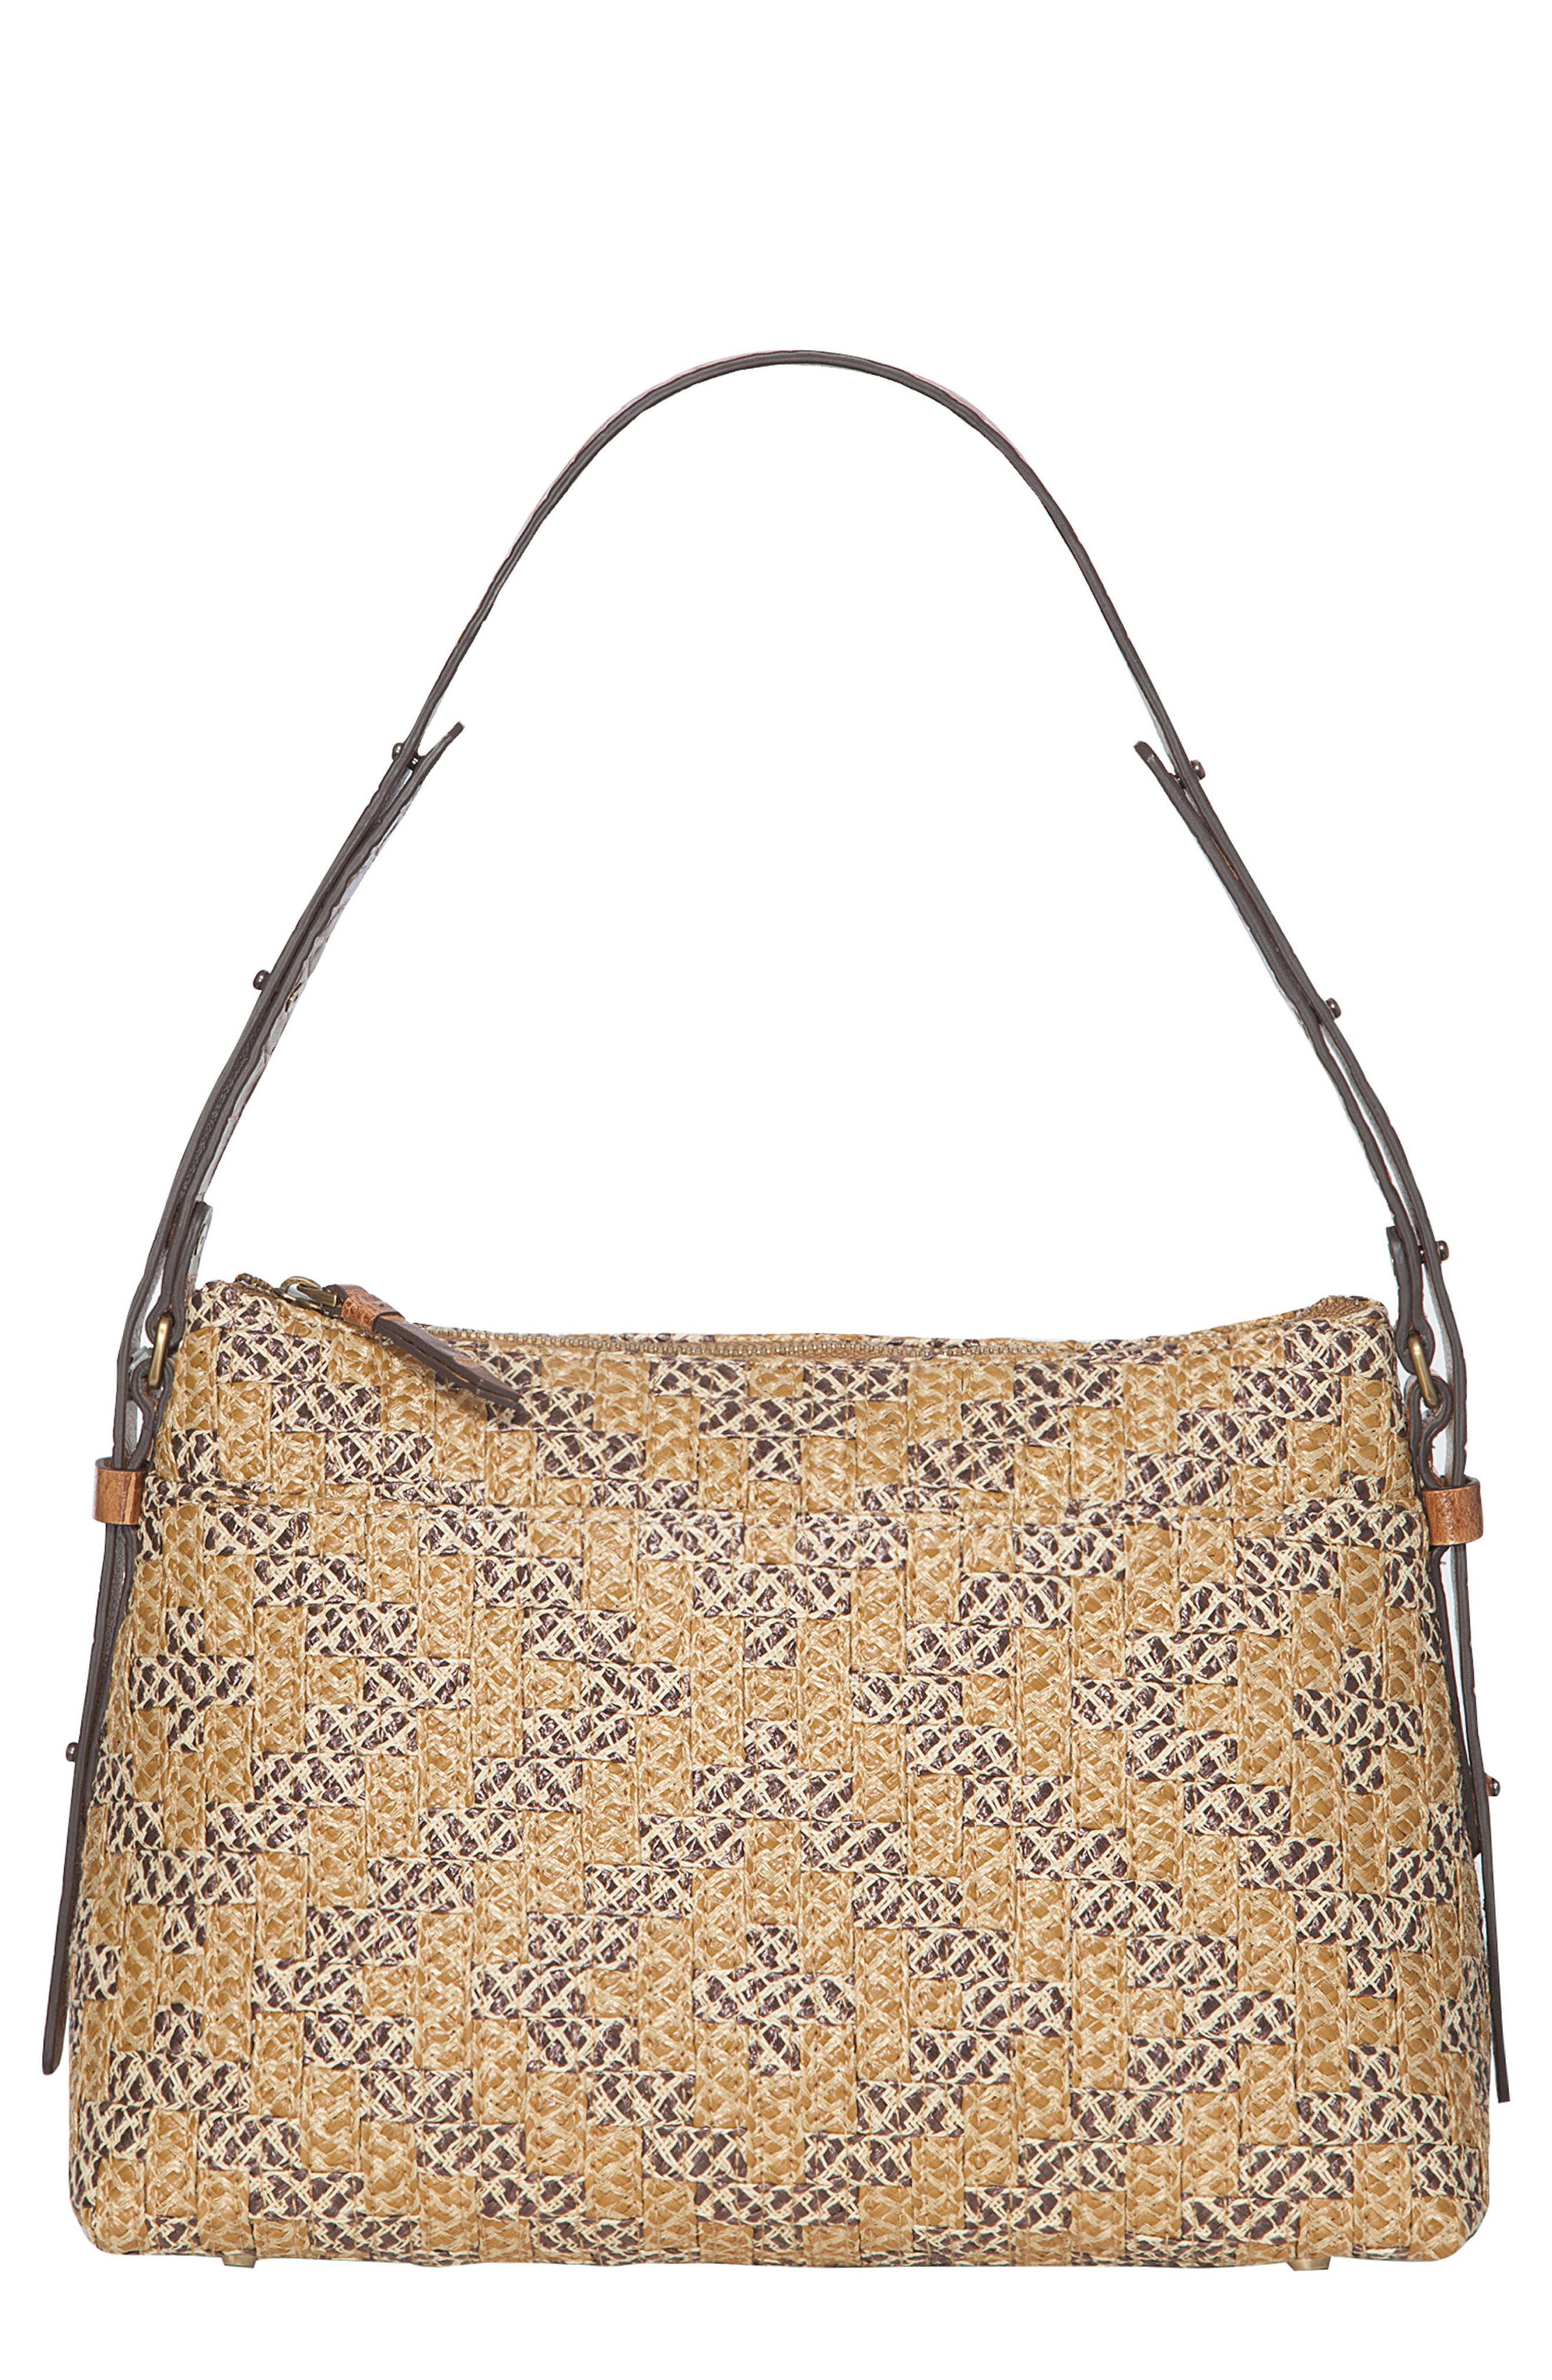 Lyst - Eric Javits Athena Squishee Shoulder Bag in Metallic 3a06464fc1b